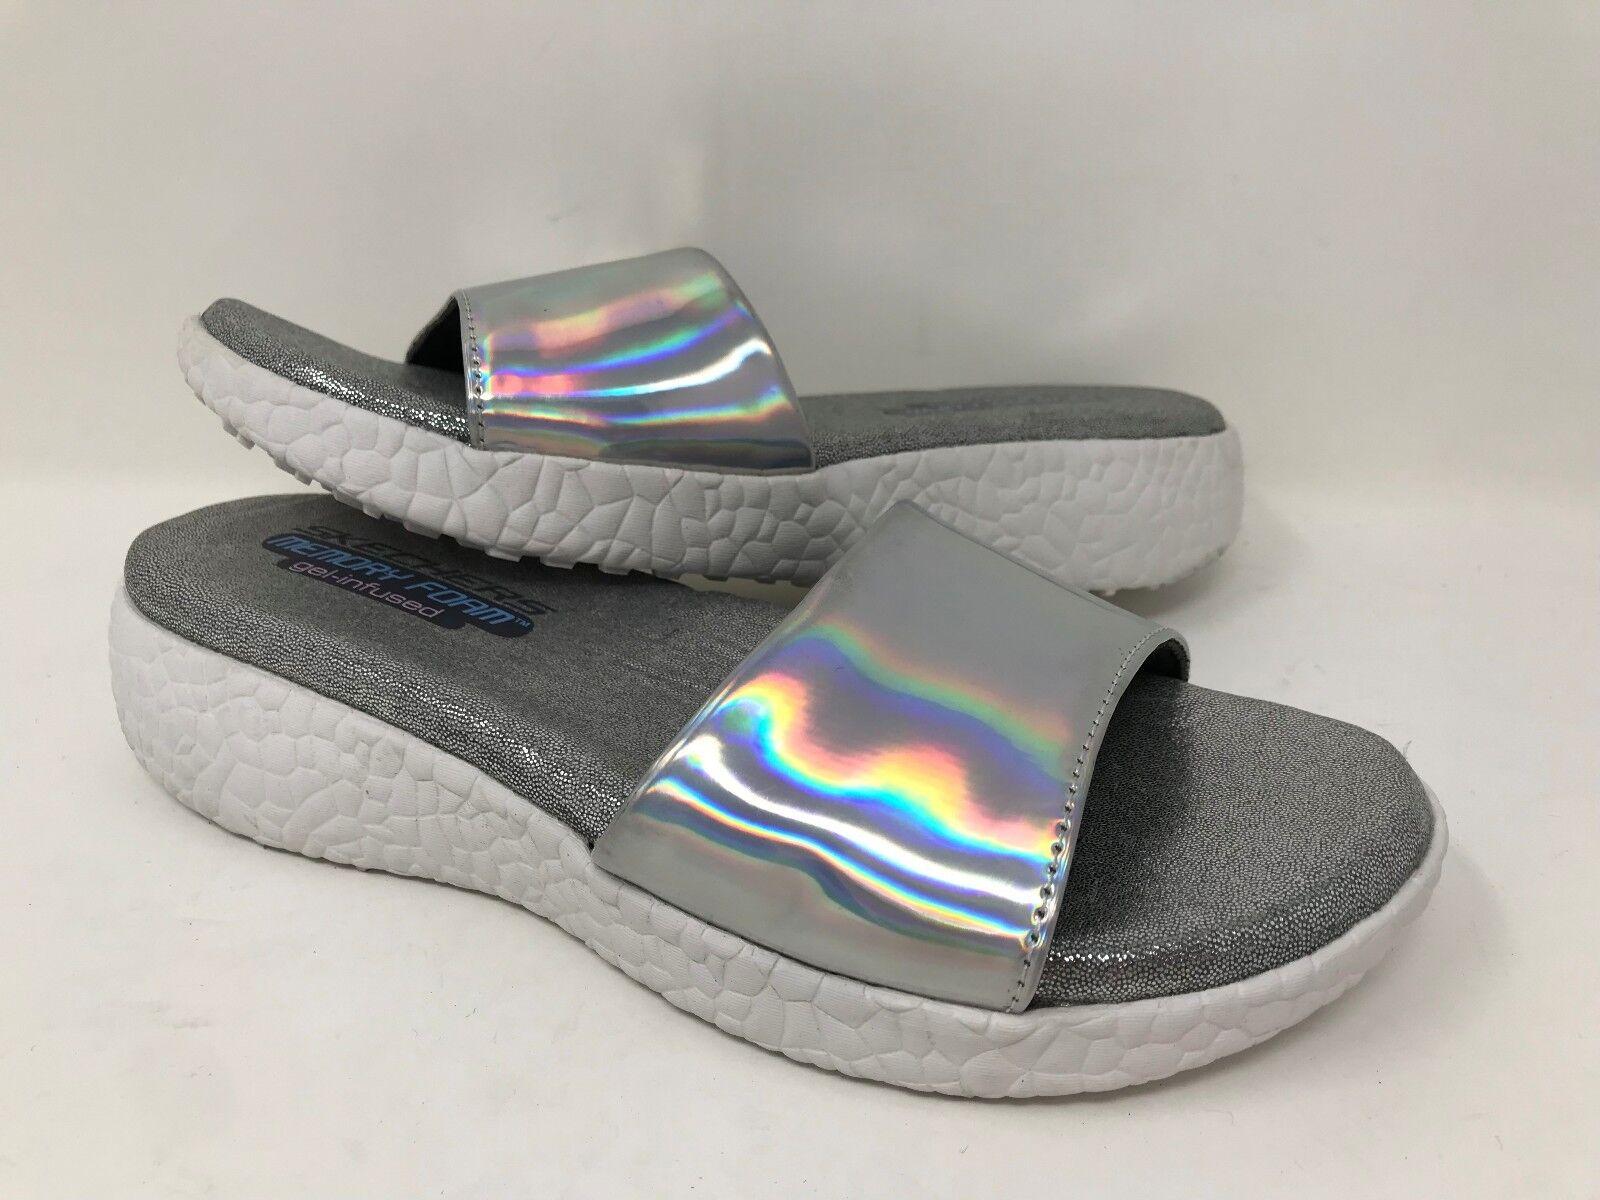 New! Women's Skechers 38600 Cali Cali 38600 Burst Introspect Sandal SIZE 6 Silver/White B42 c126ba